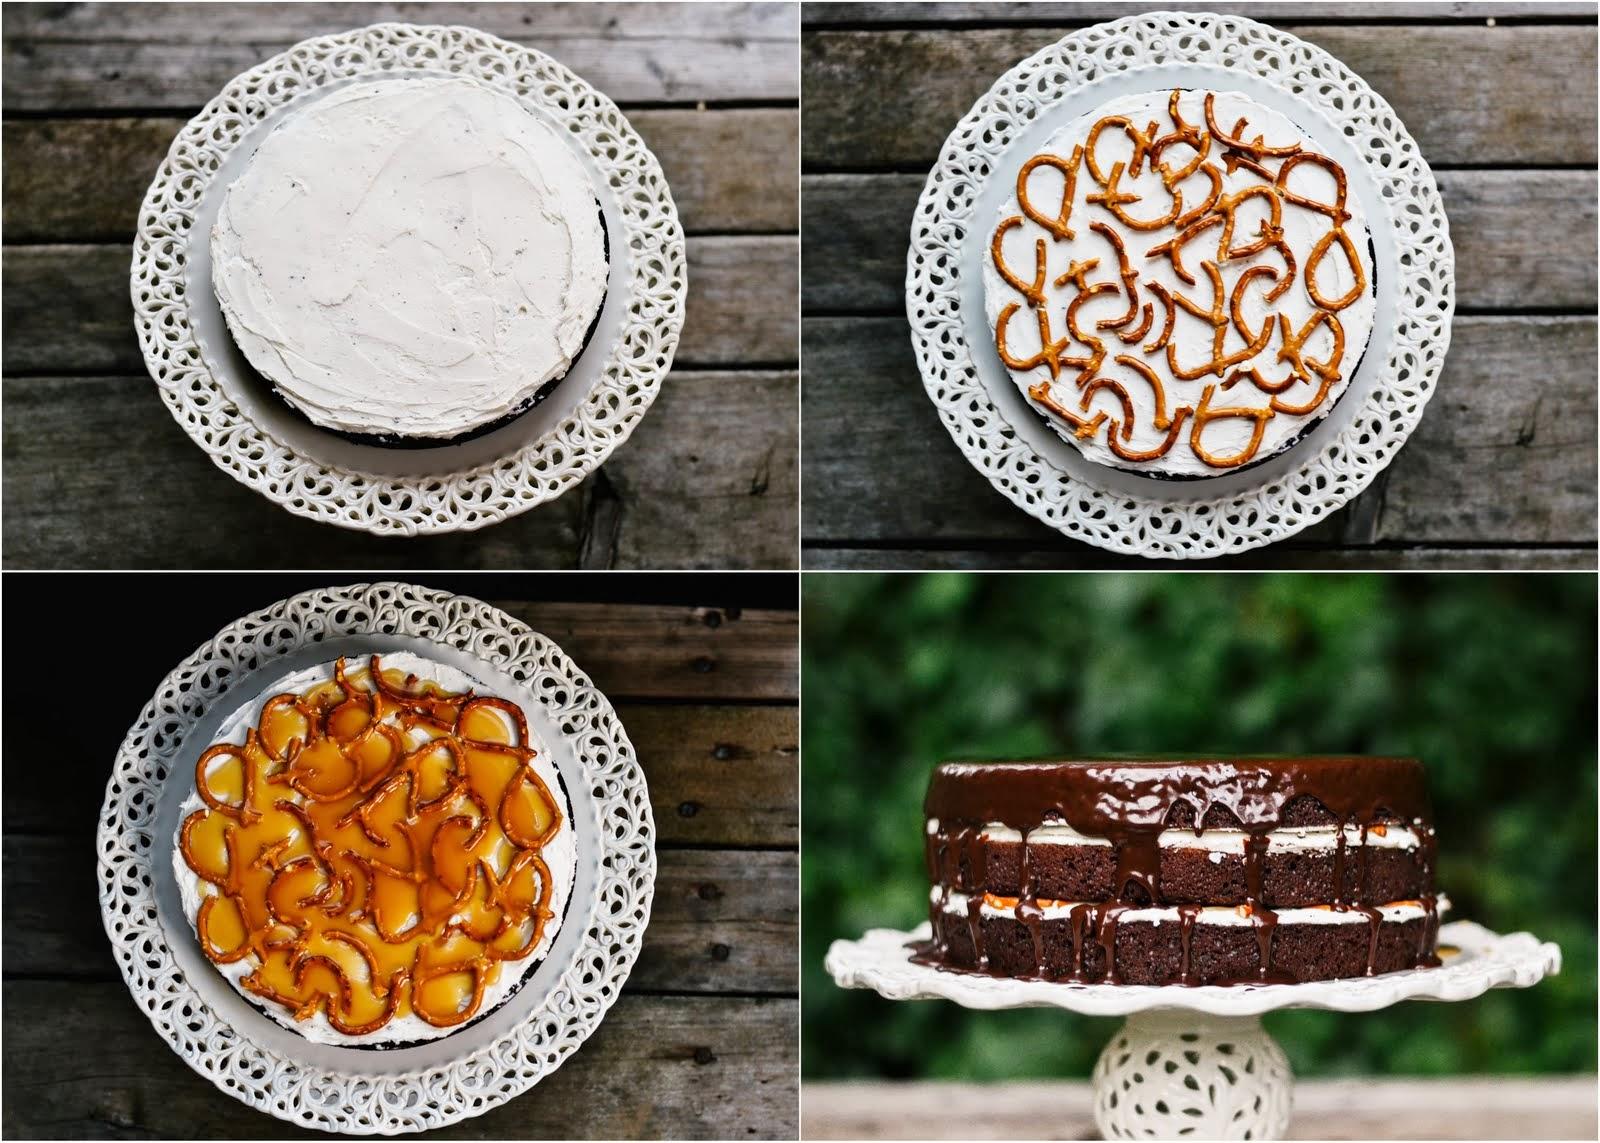 bday+cake+mocha+pretzel+caramel-001.jpg